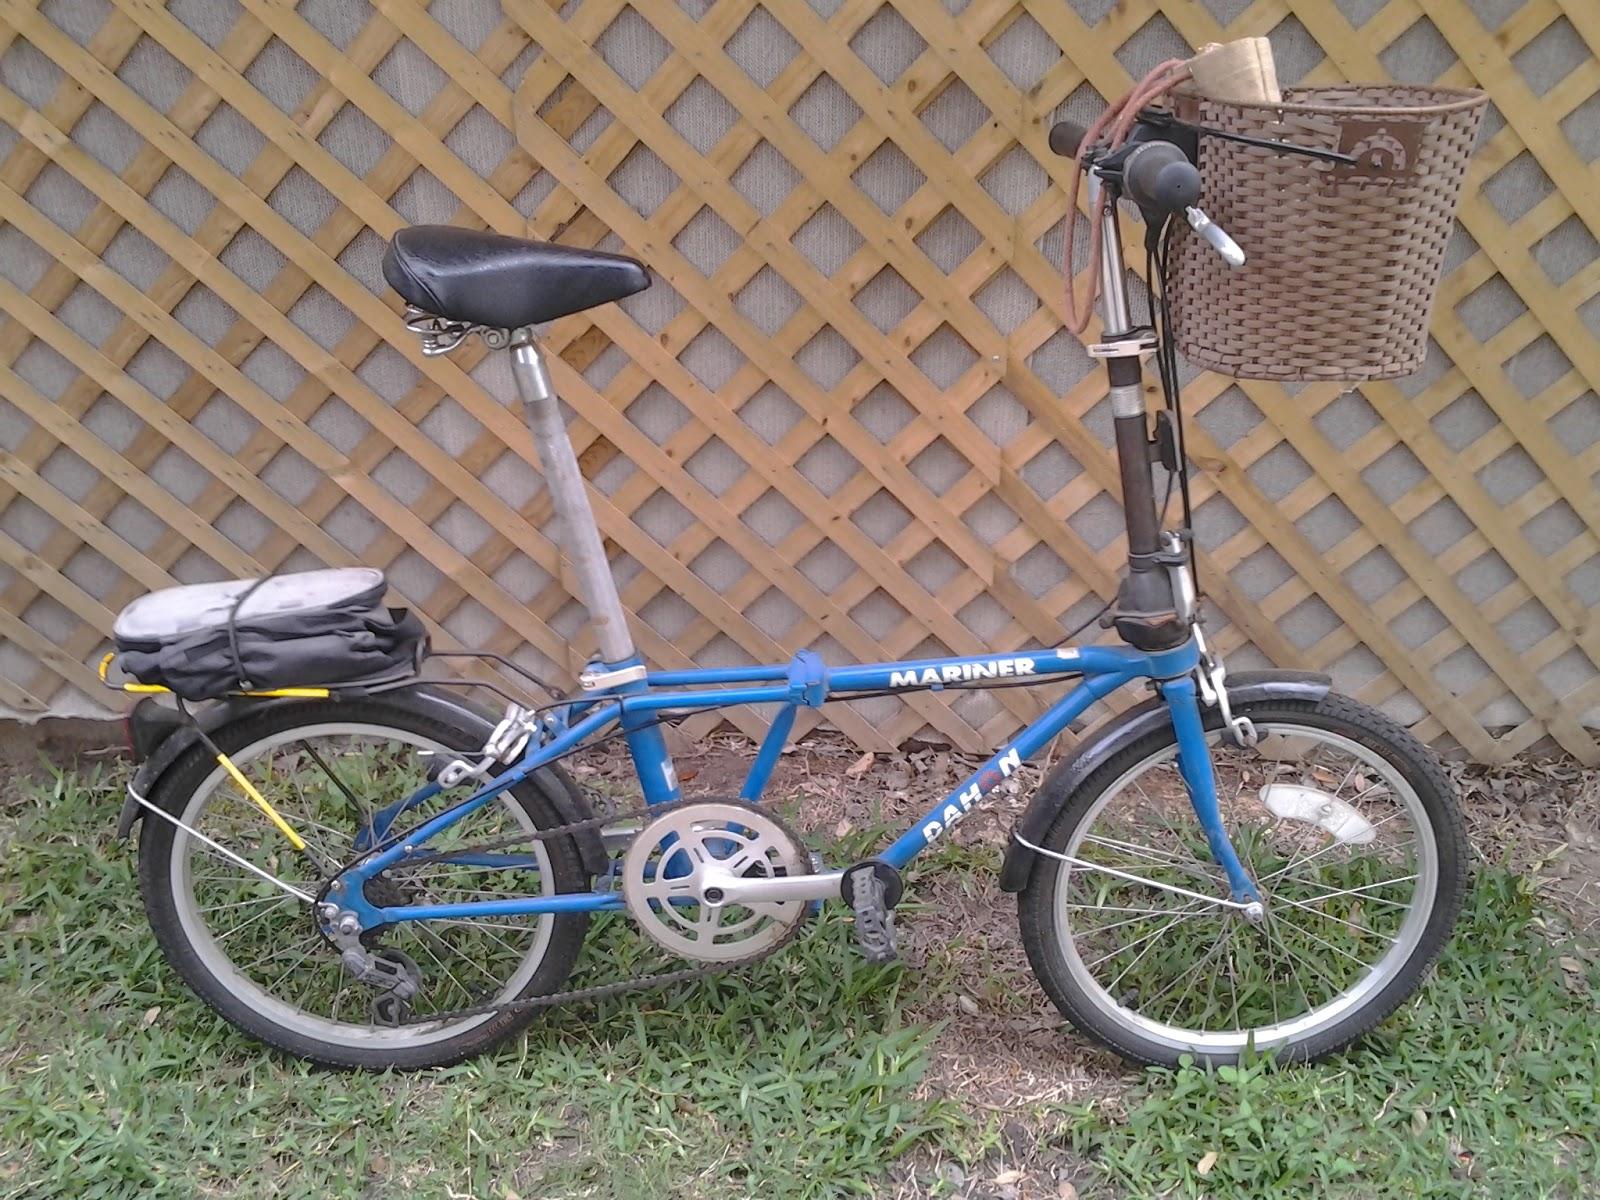 "<img src=""filename.gif"" alt=""'98 Dahon Mariner folding bicycle"">"